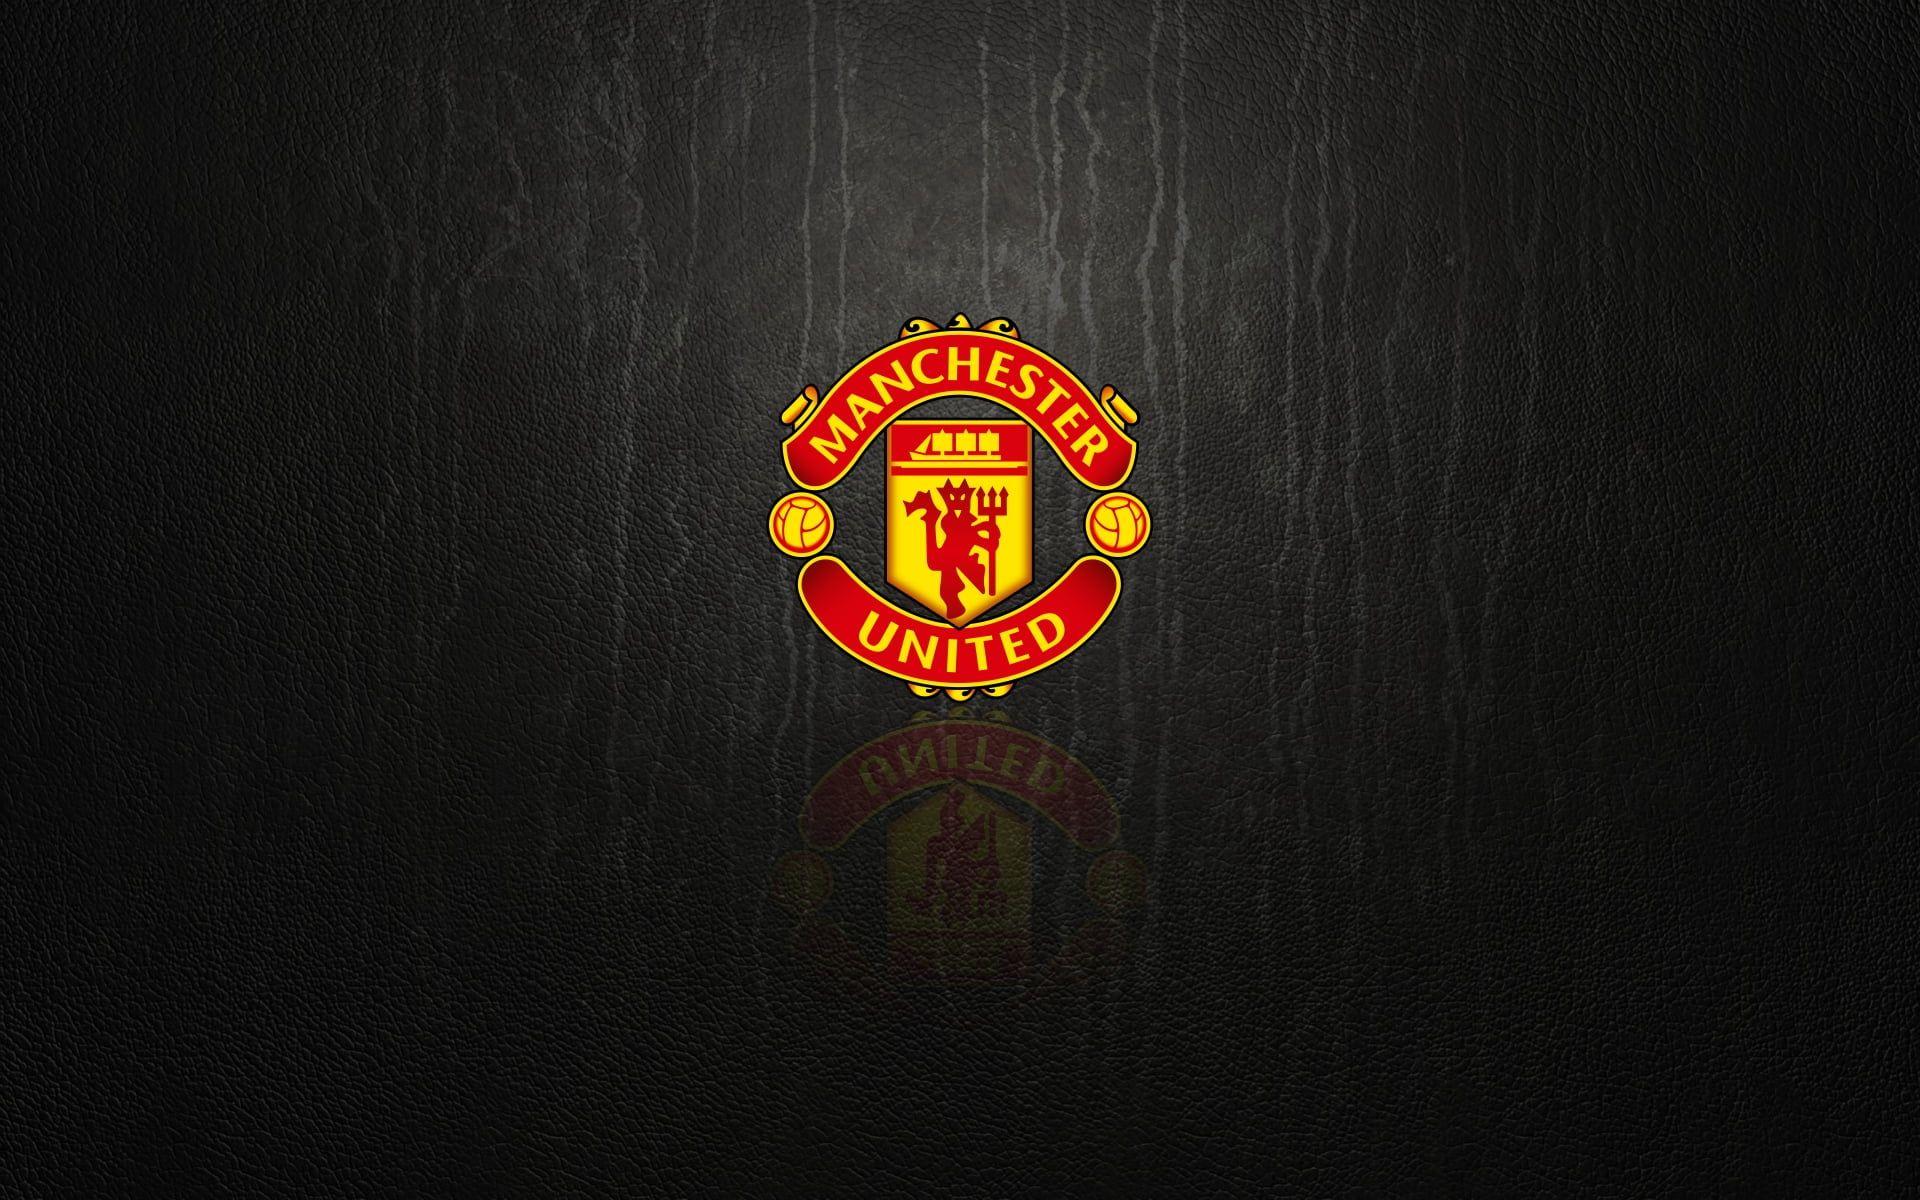 Soccer Manchester United F C Emblem Logo 1080p Wallpaper Hdwallpaper Desktop In 2020 Manchester United Wallpaper Manchester United Logo Logo Wallpaper Hd